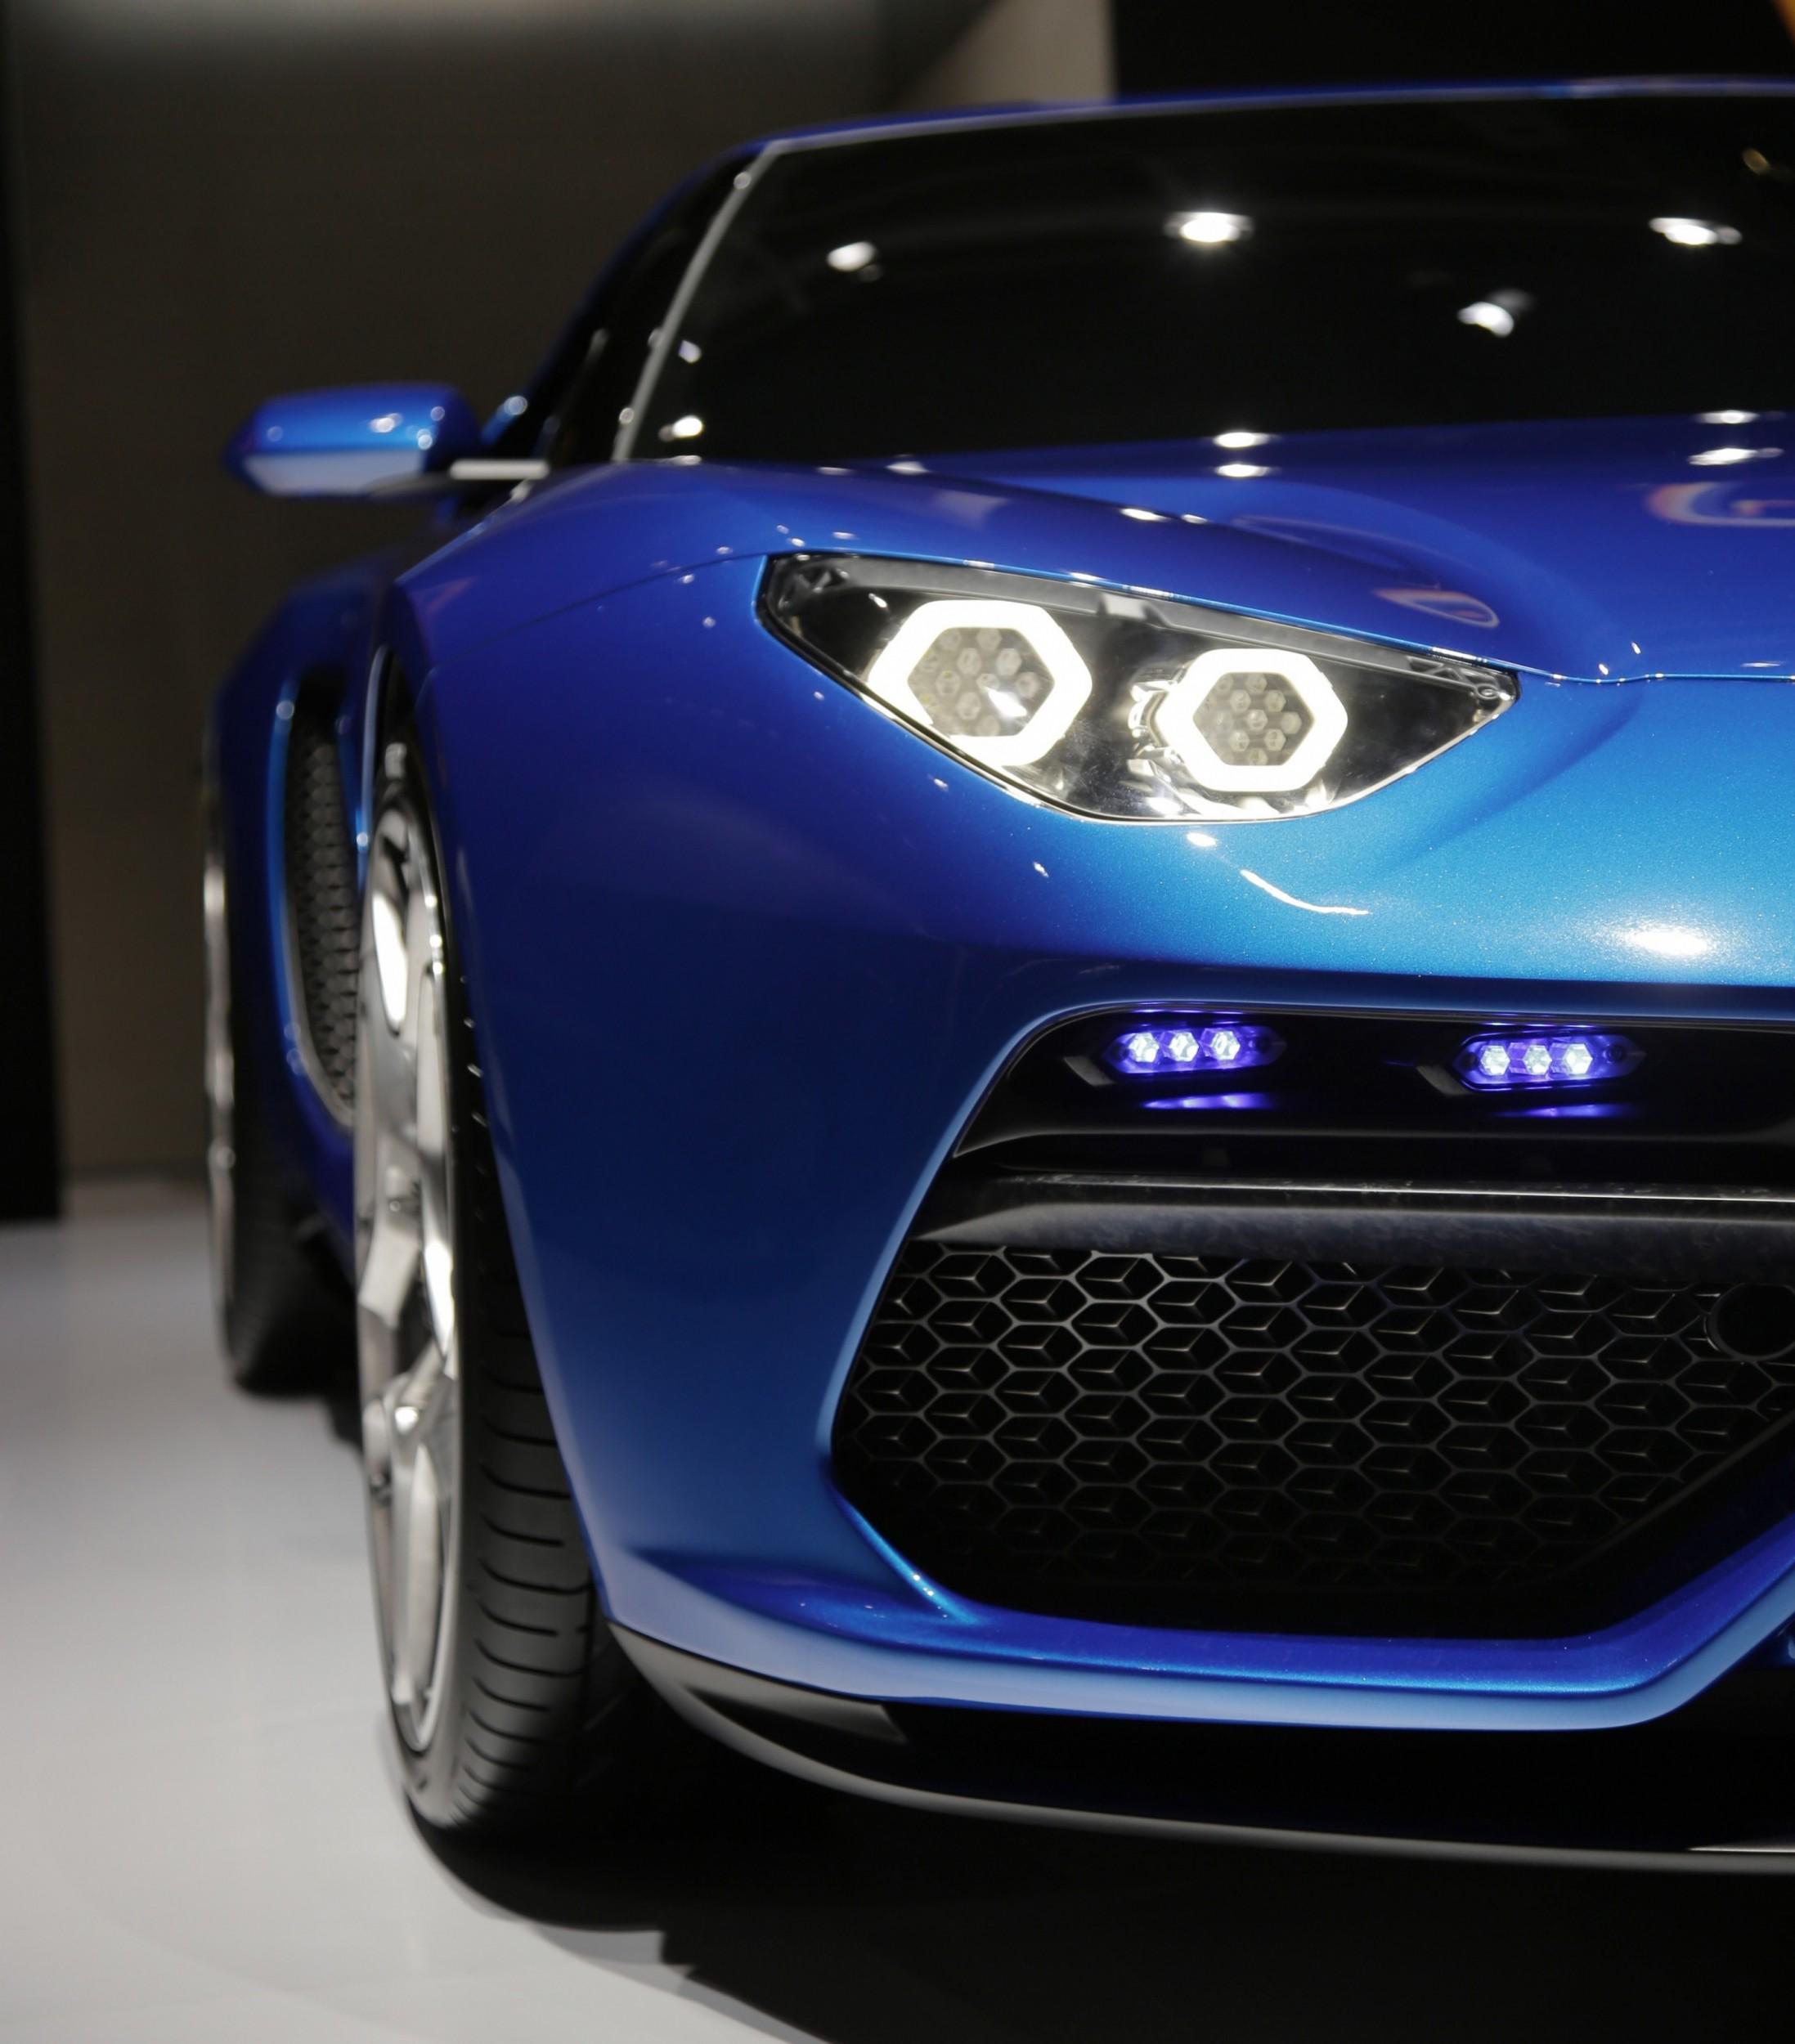 Lamborghini Asterion Lpi 910 4 16